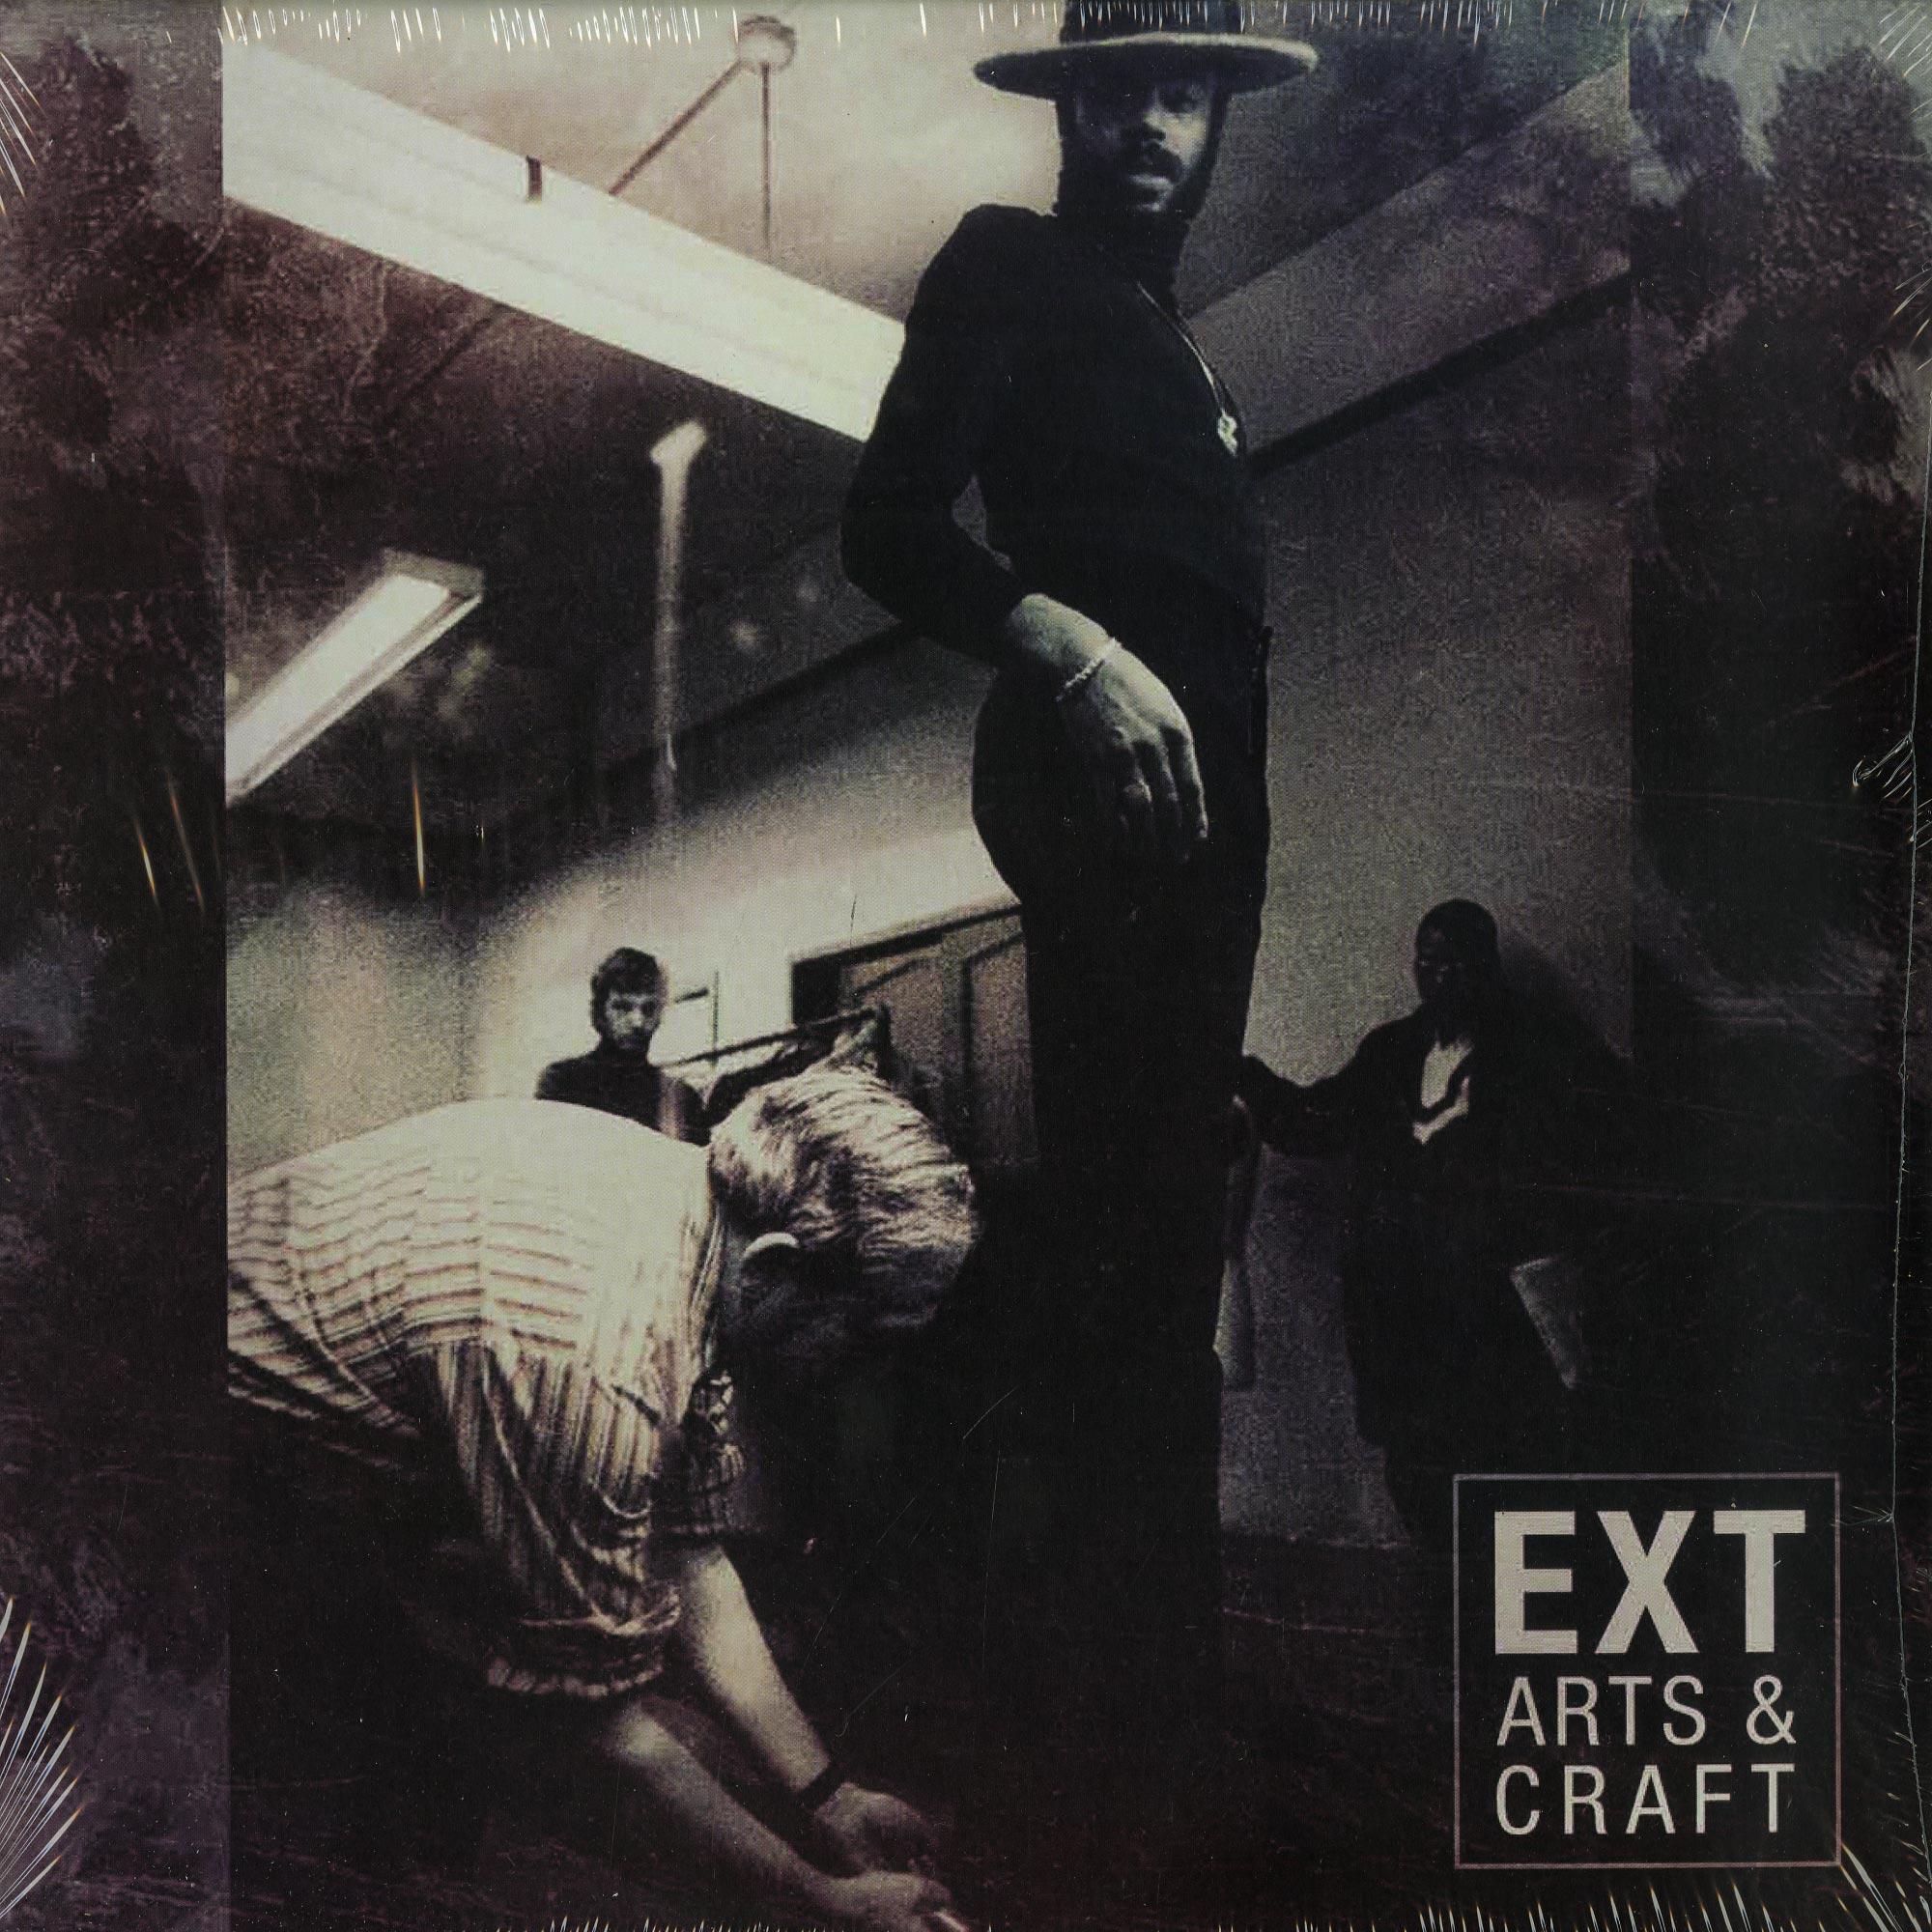 Ext - ARTS & CRAFT